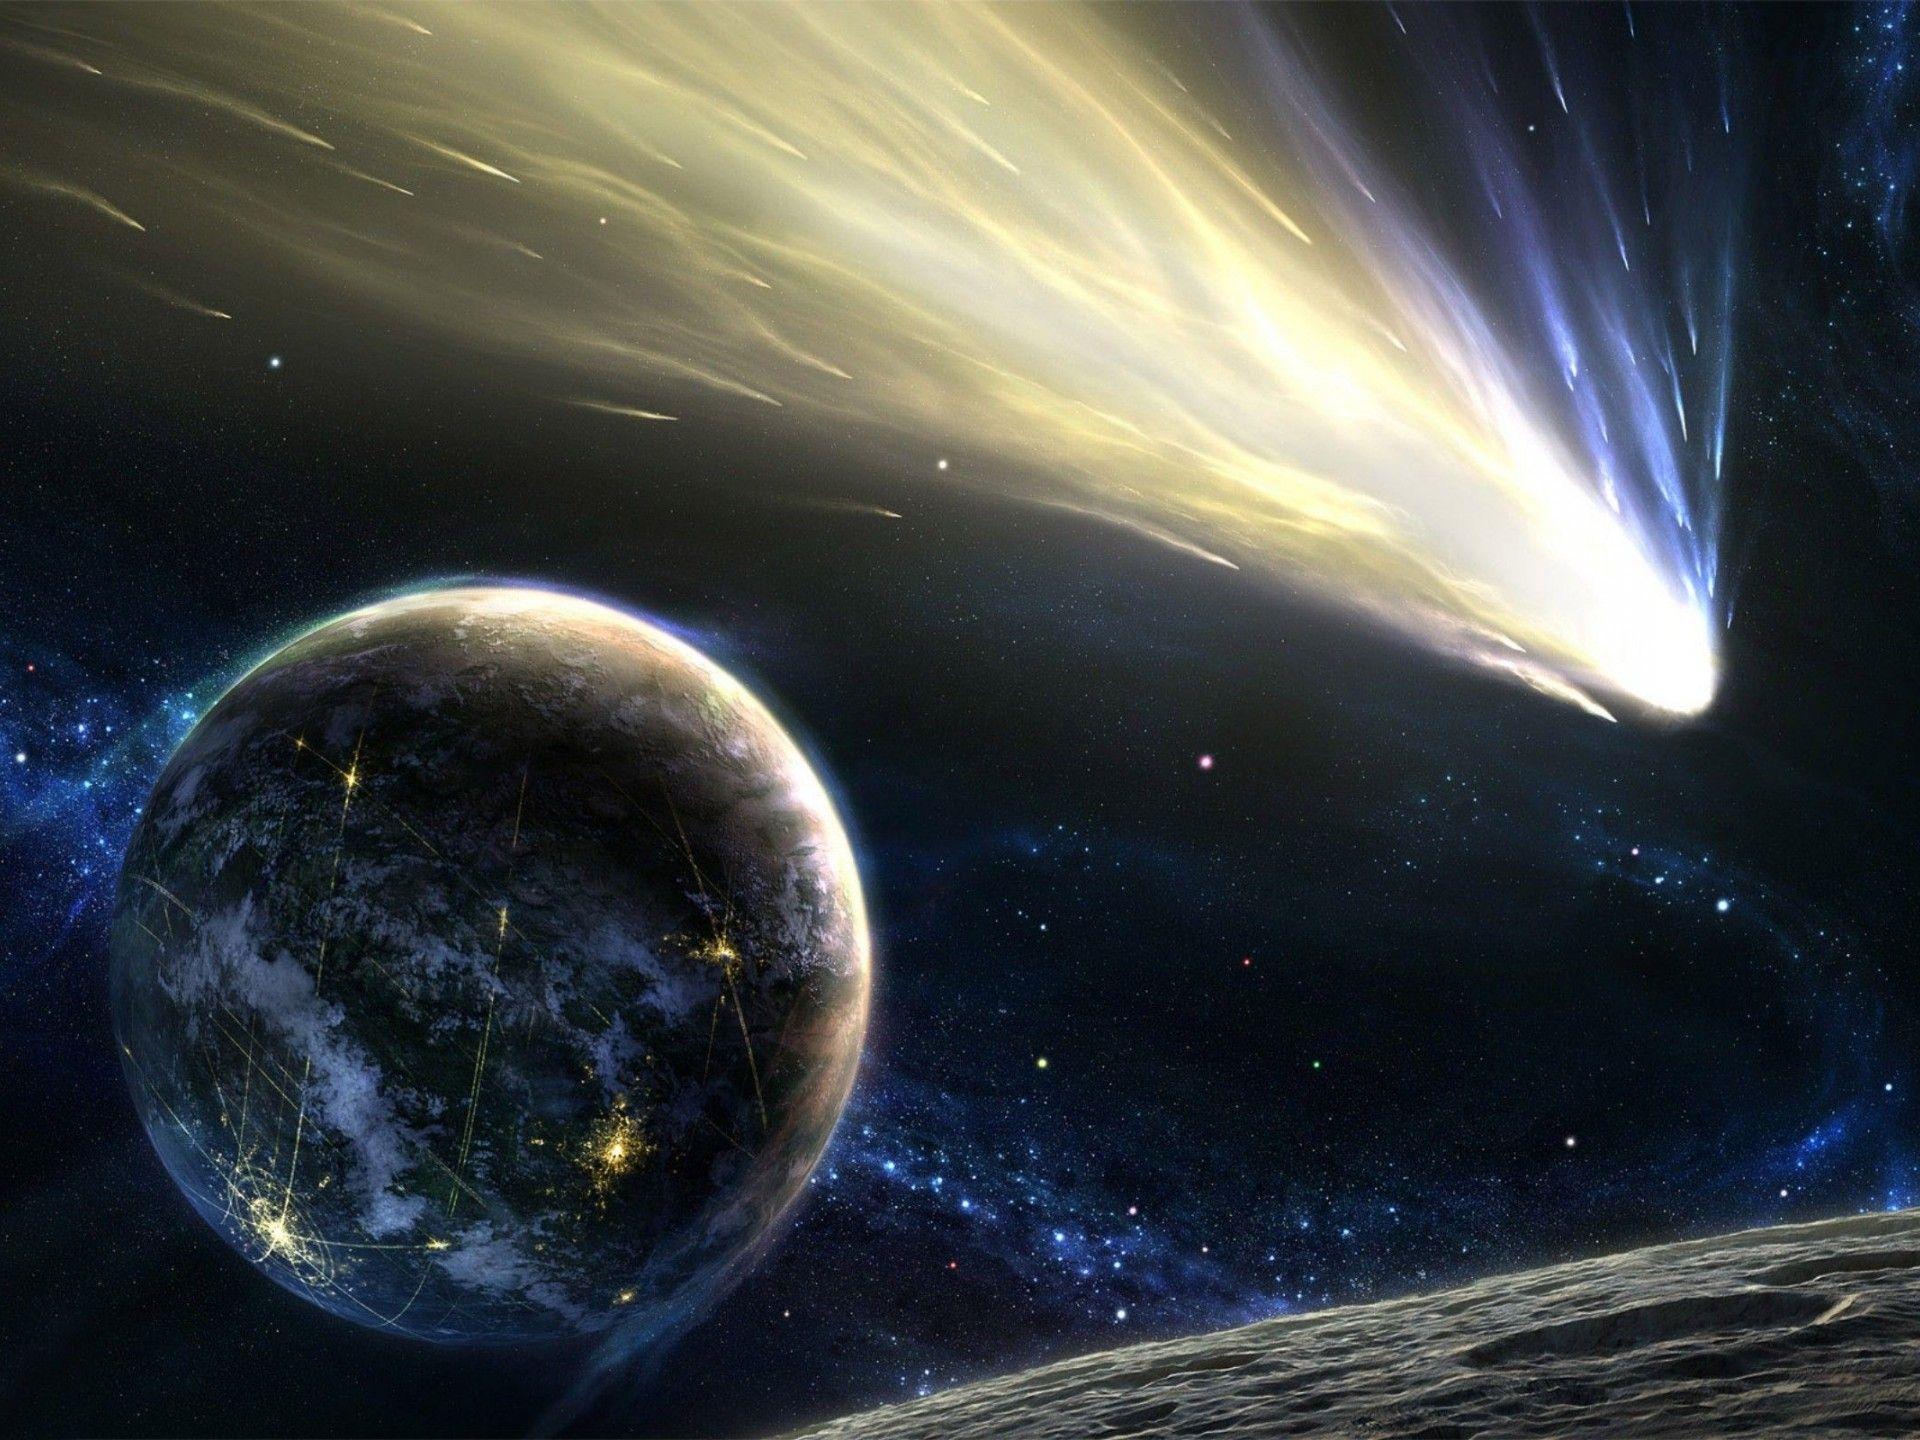 sun moon star background - photo #10